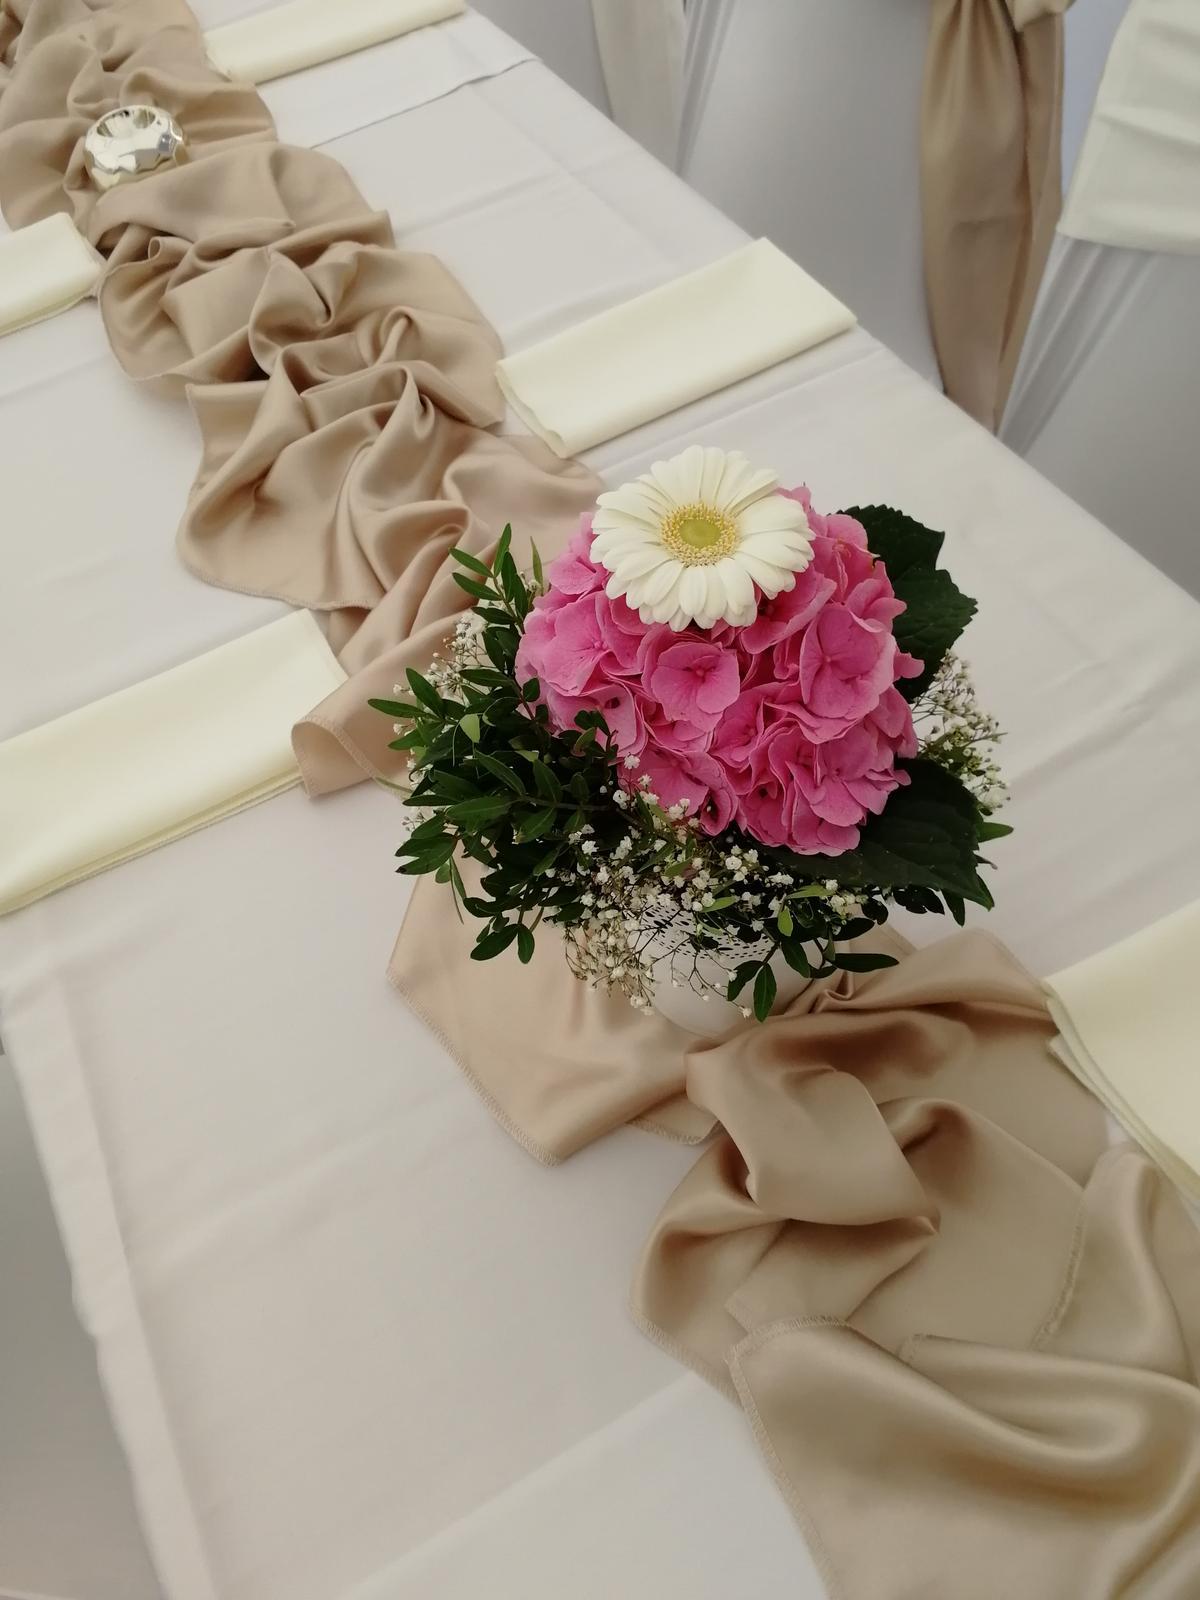 Svadba 8.9.2018 pod stanom :-) - Obrázok č. 8